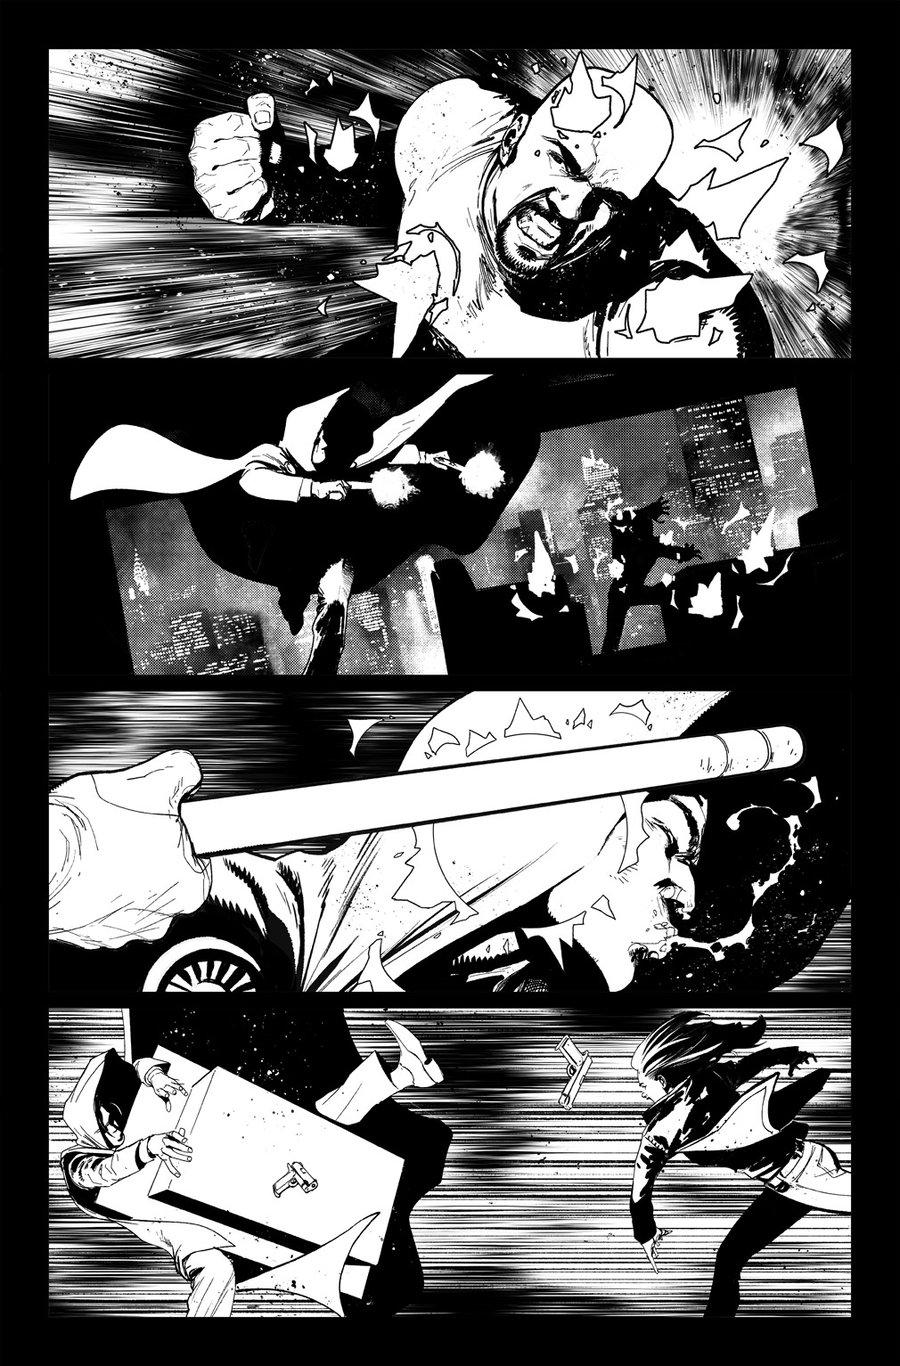 Image of DEFENDERS #10, p.14 ARTIST'S PROOF